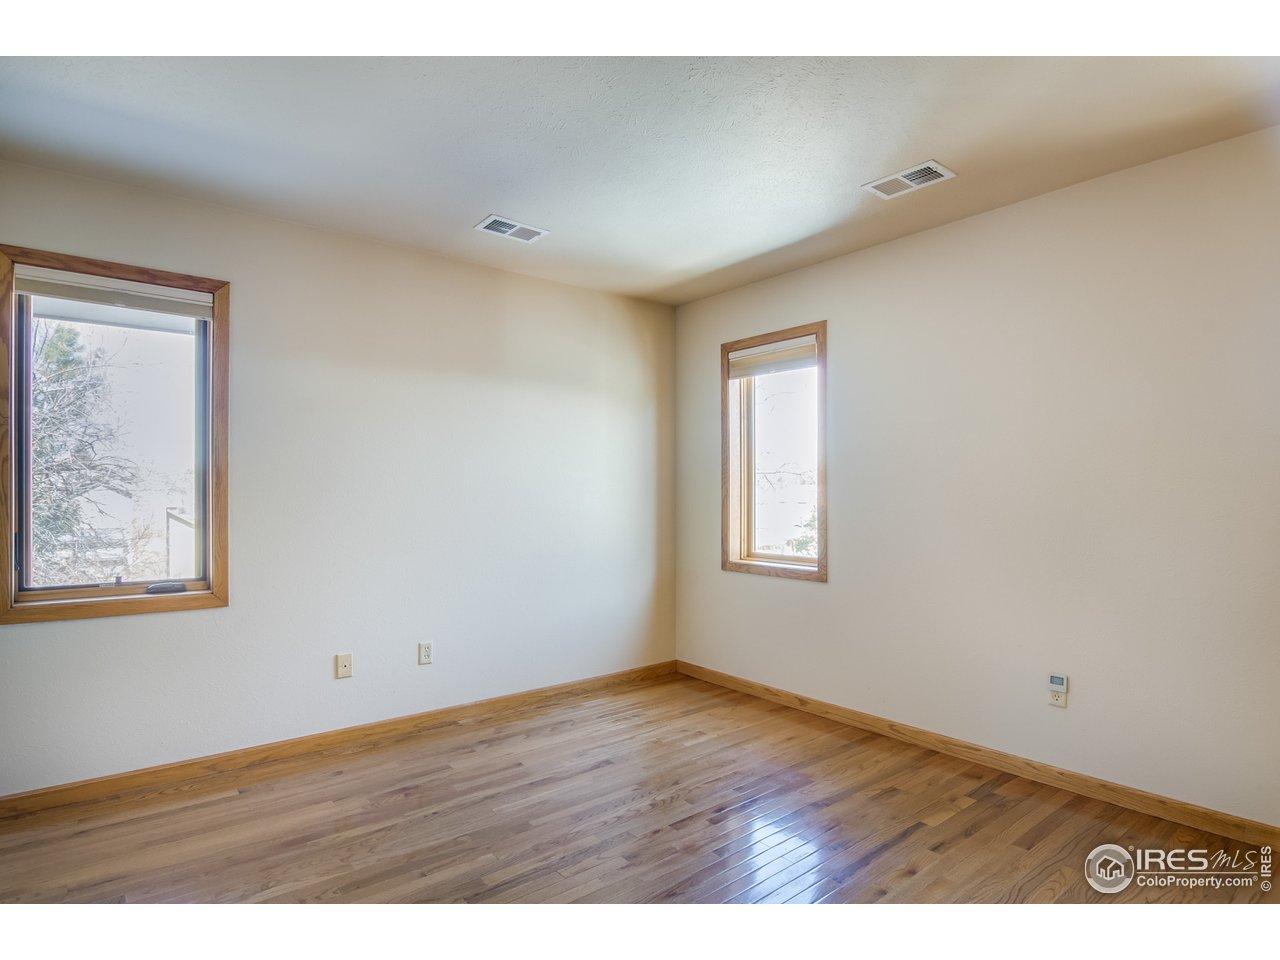 2nd Upstairs Bedroom